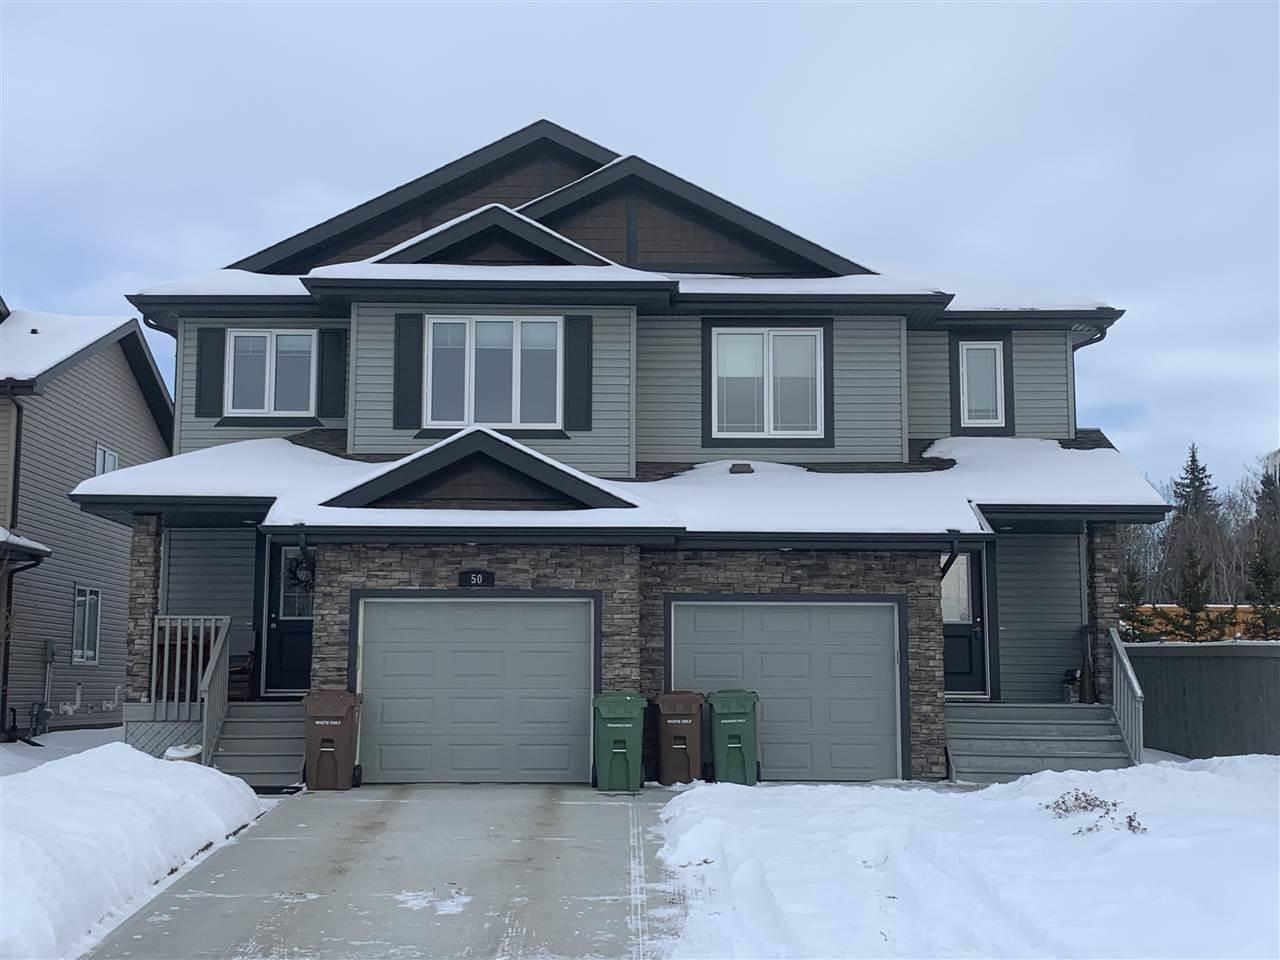 Townhouse for sale at 52 Royal St St. Albert Alberta - MLS: E4187453